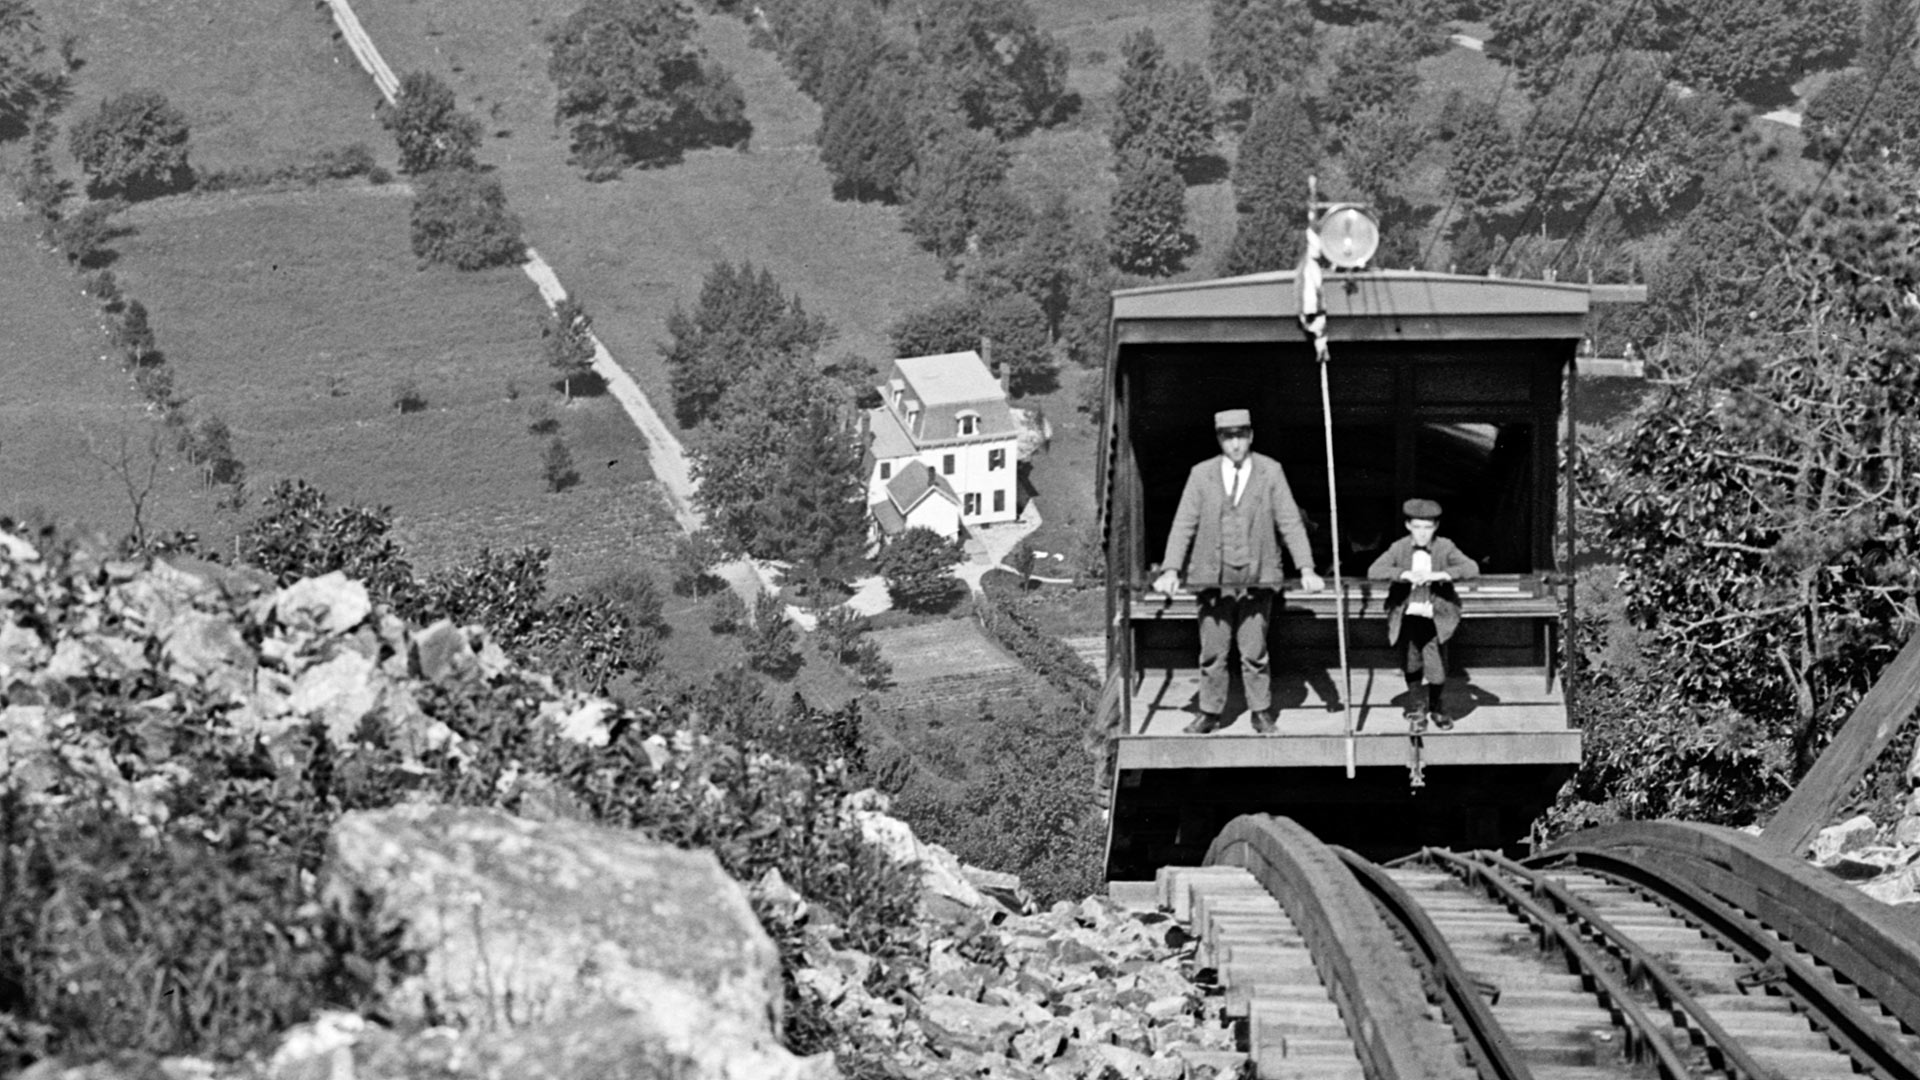 Mount Beacon Incline Railway (1901-1978)